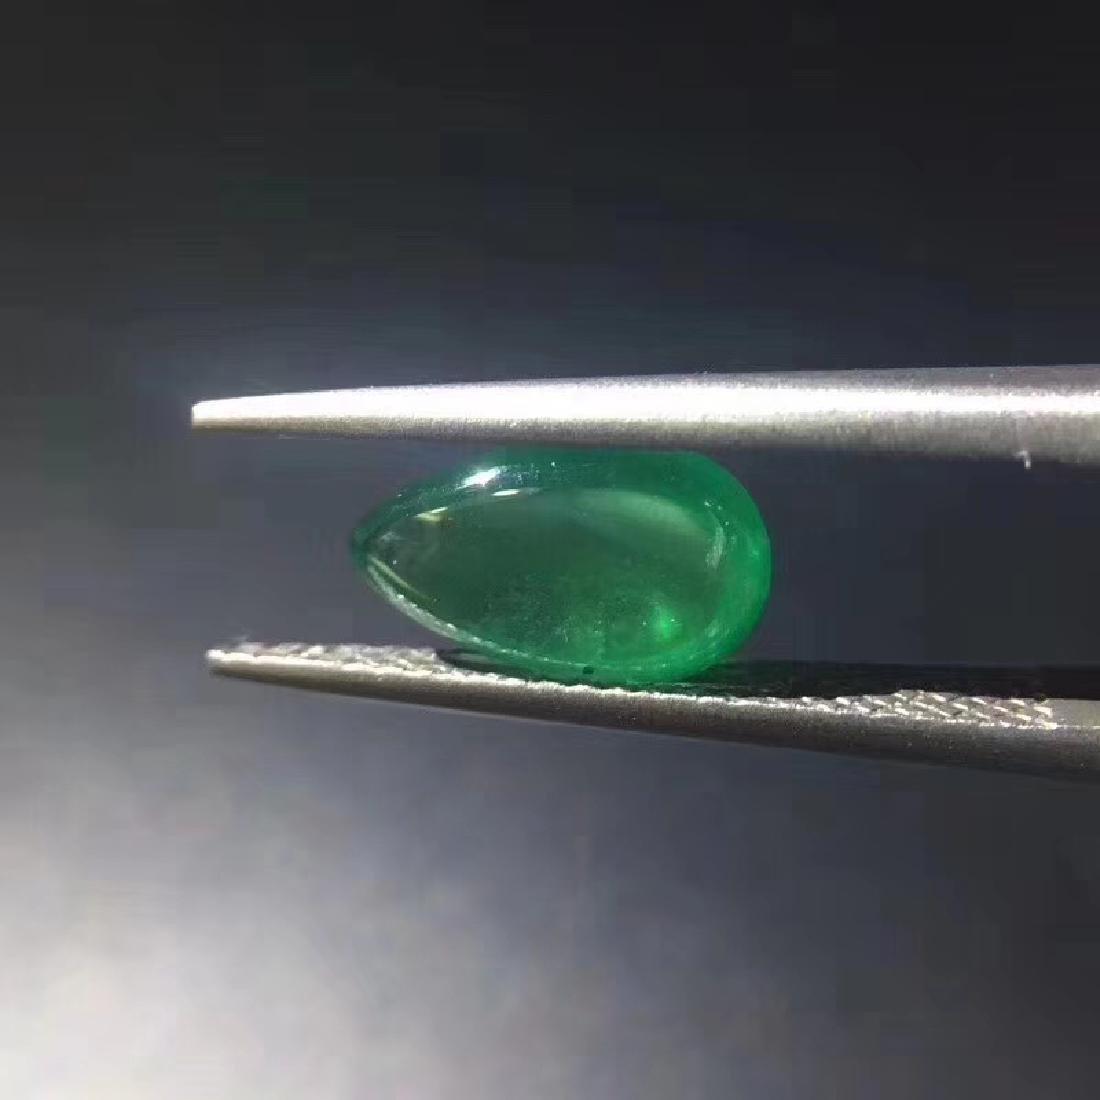 1.51 ct Emerald 6.0*10*3.7 mm Pear Cut - 5